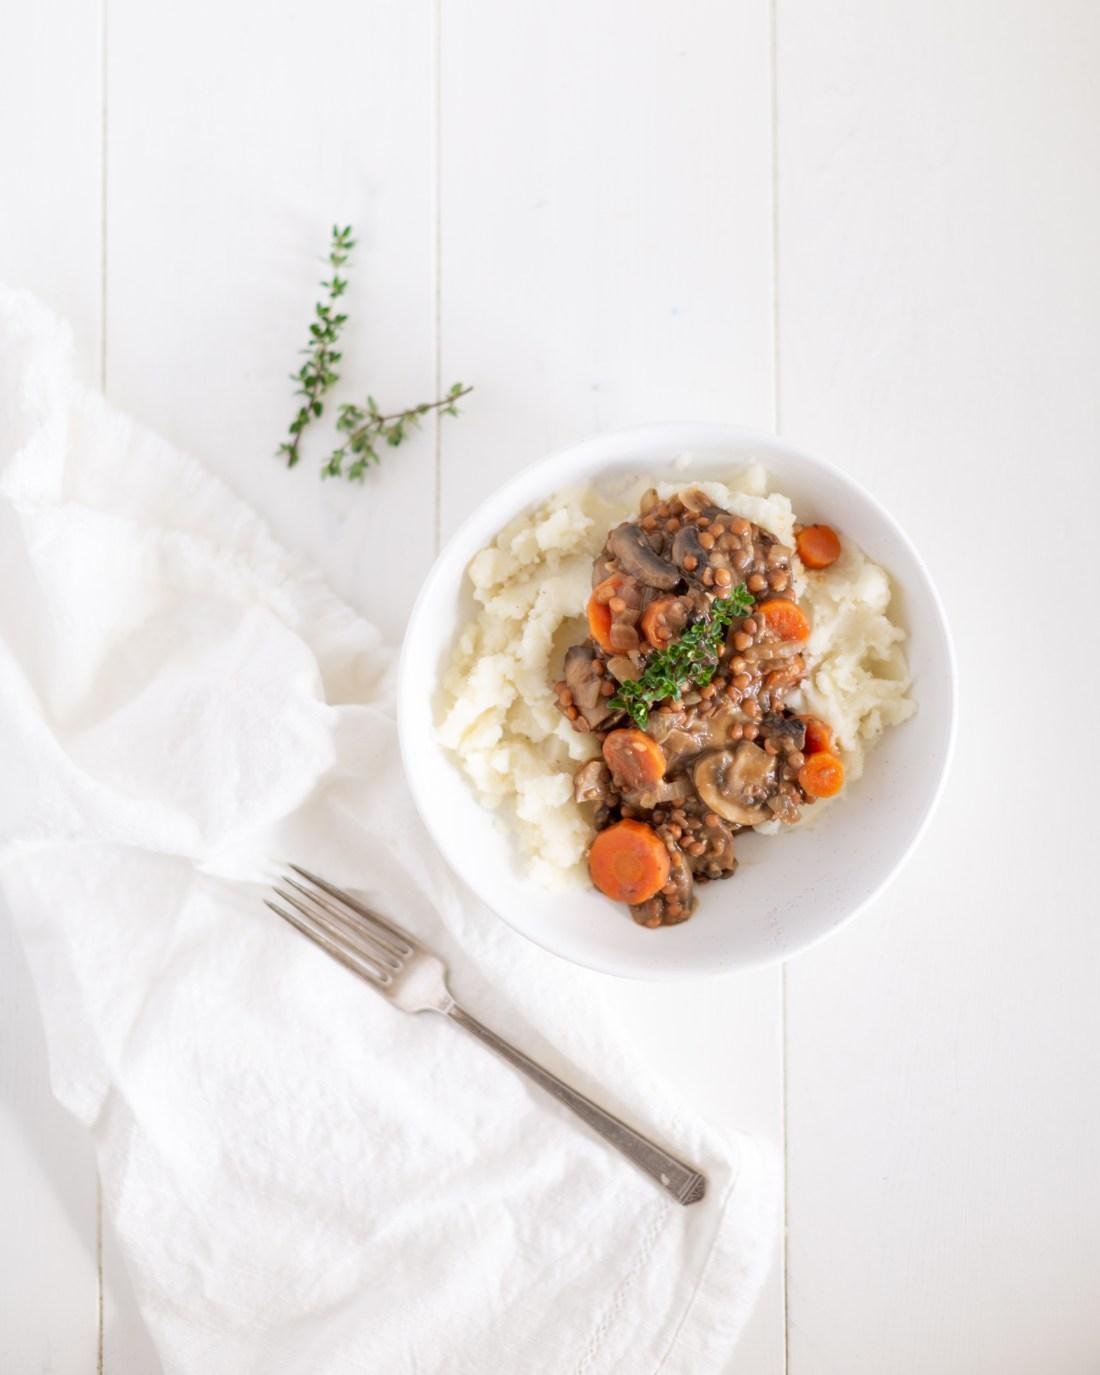 Easy Vegan and Gluten Free Lentil Mushroom Stew Recipe